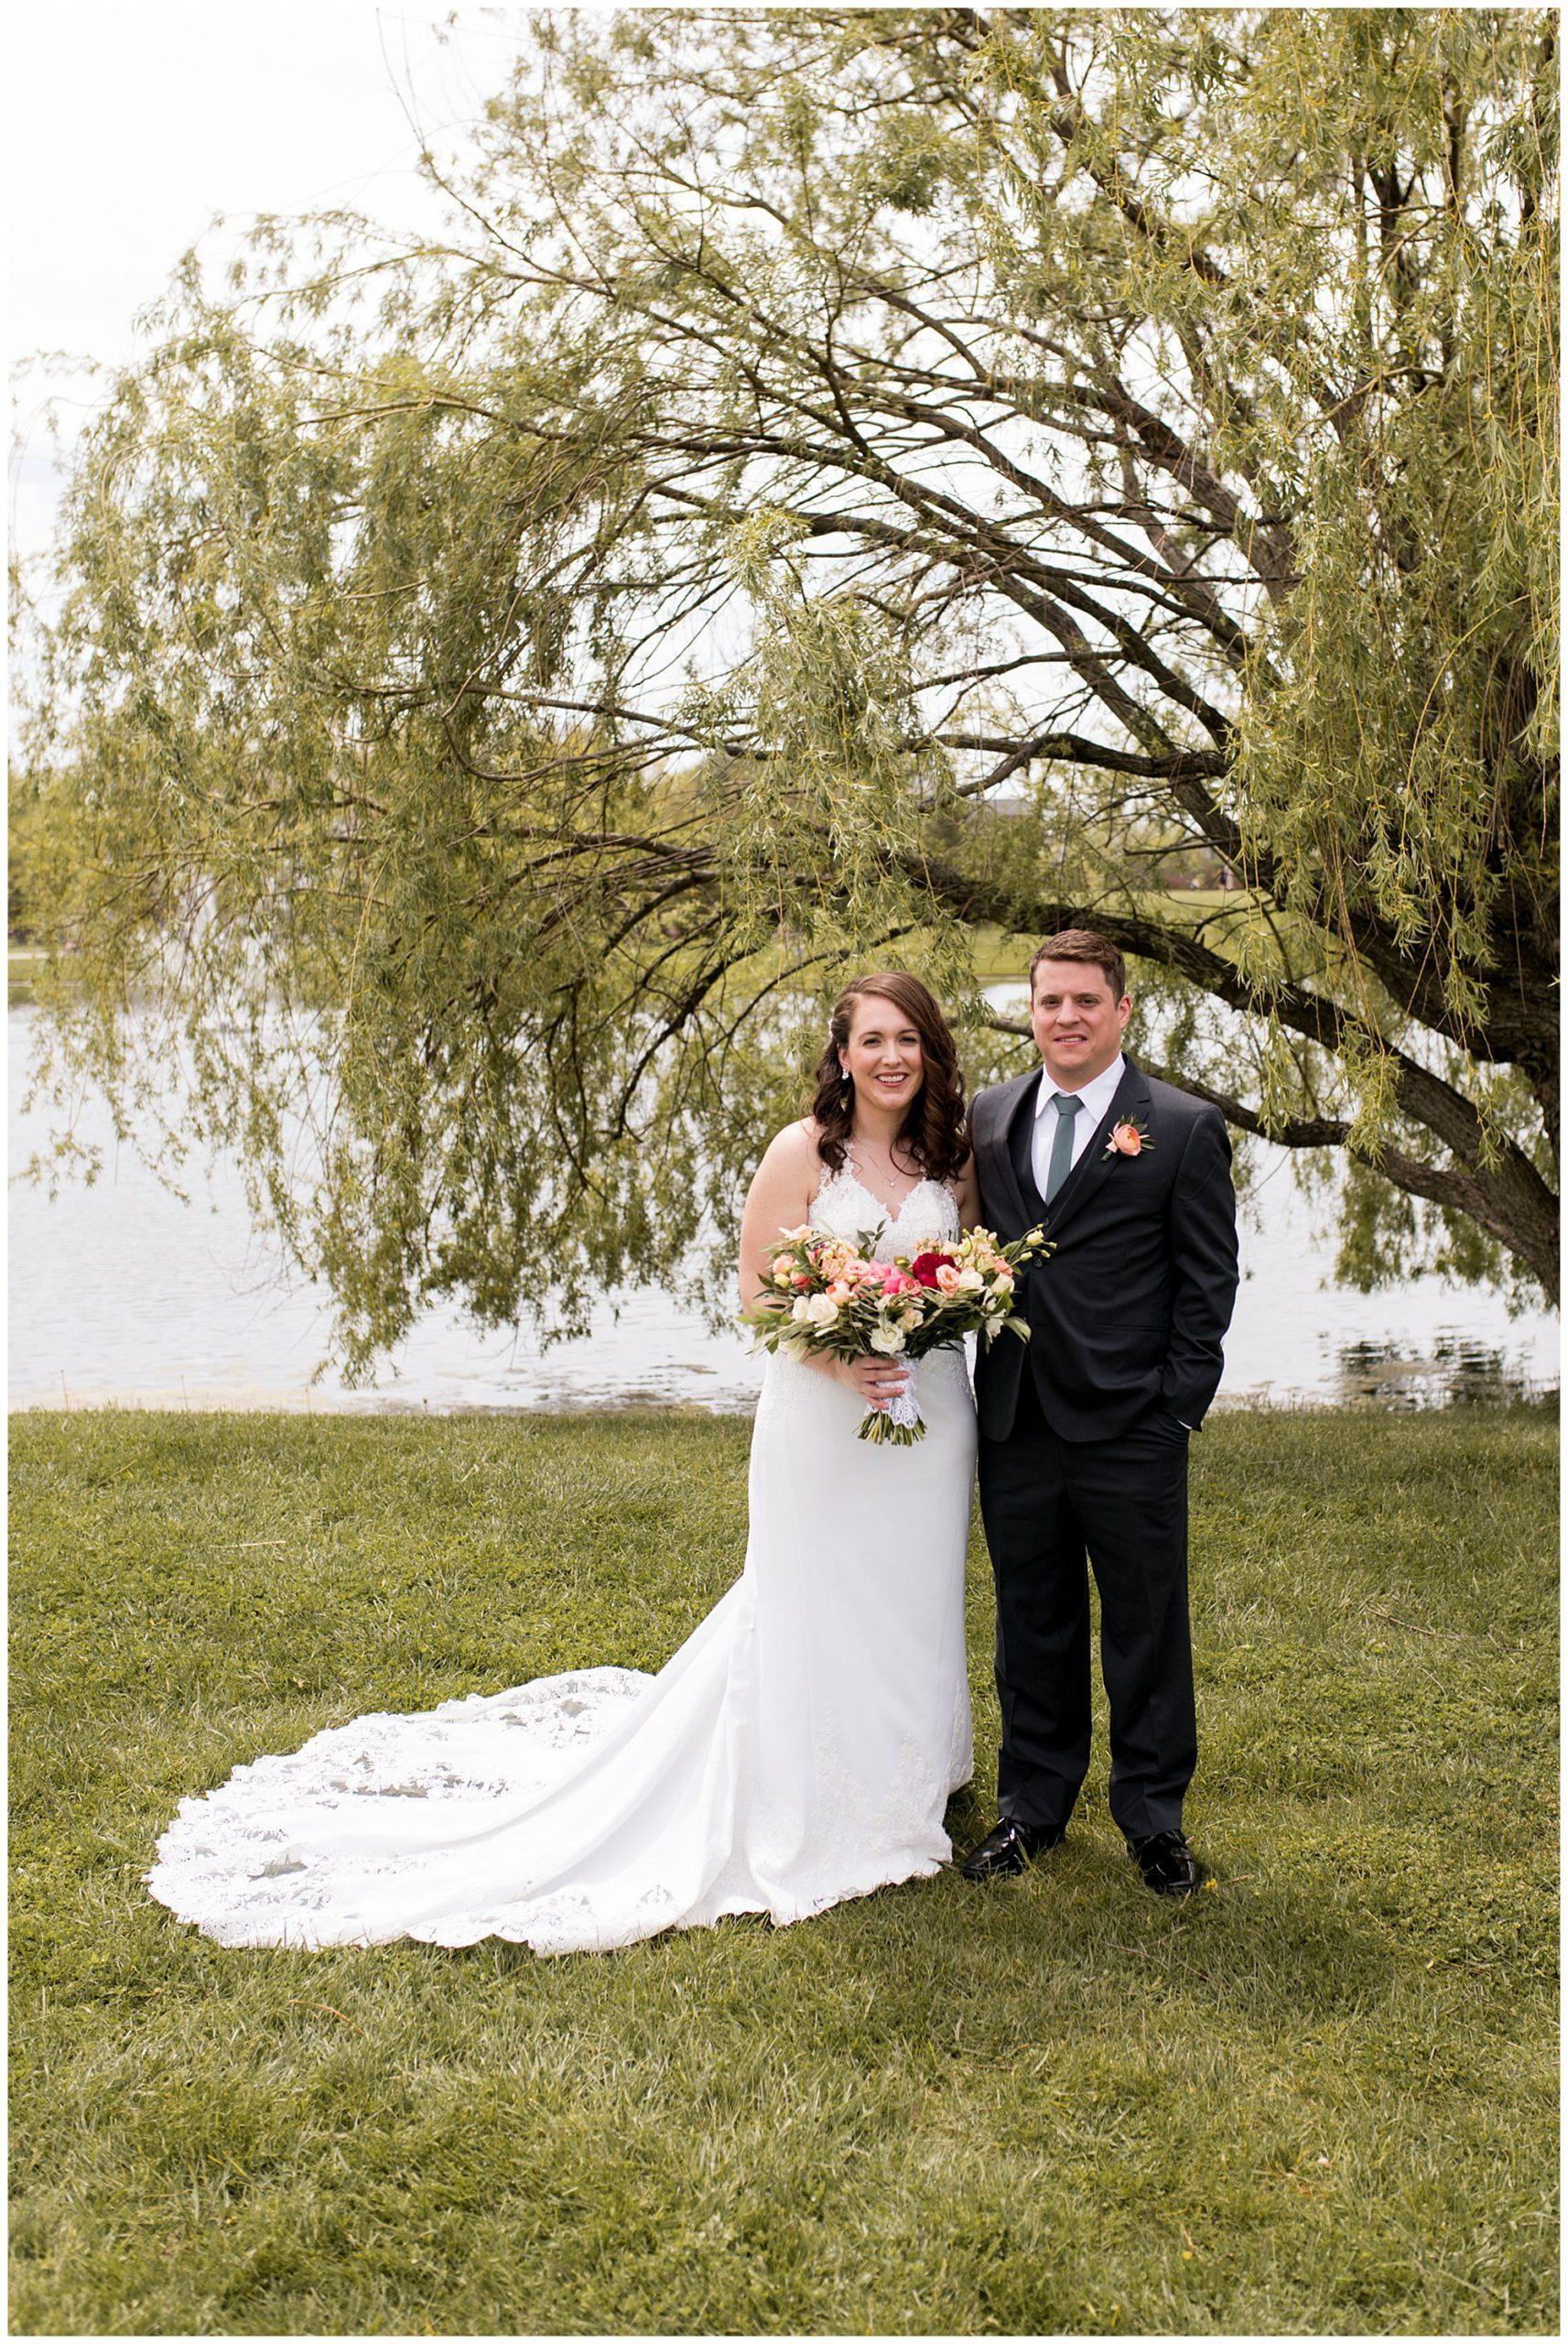 Coxhall Gardens bride and groom portraits